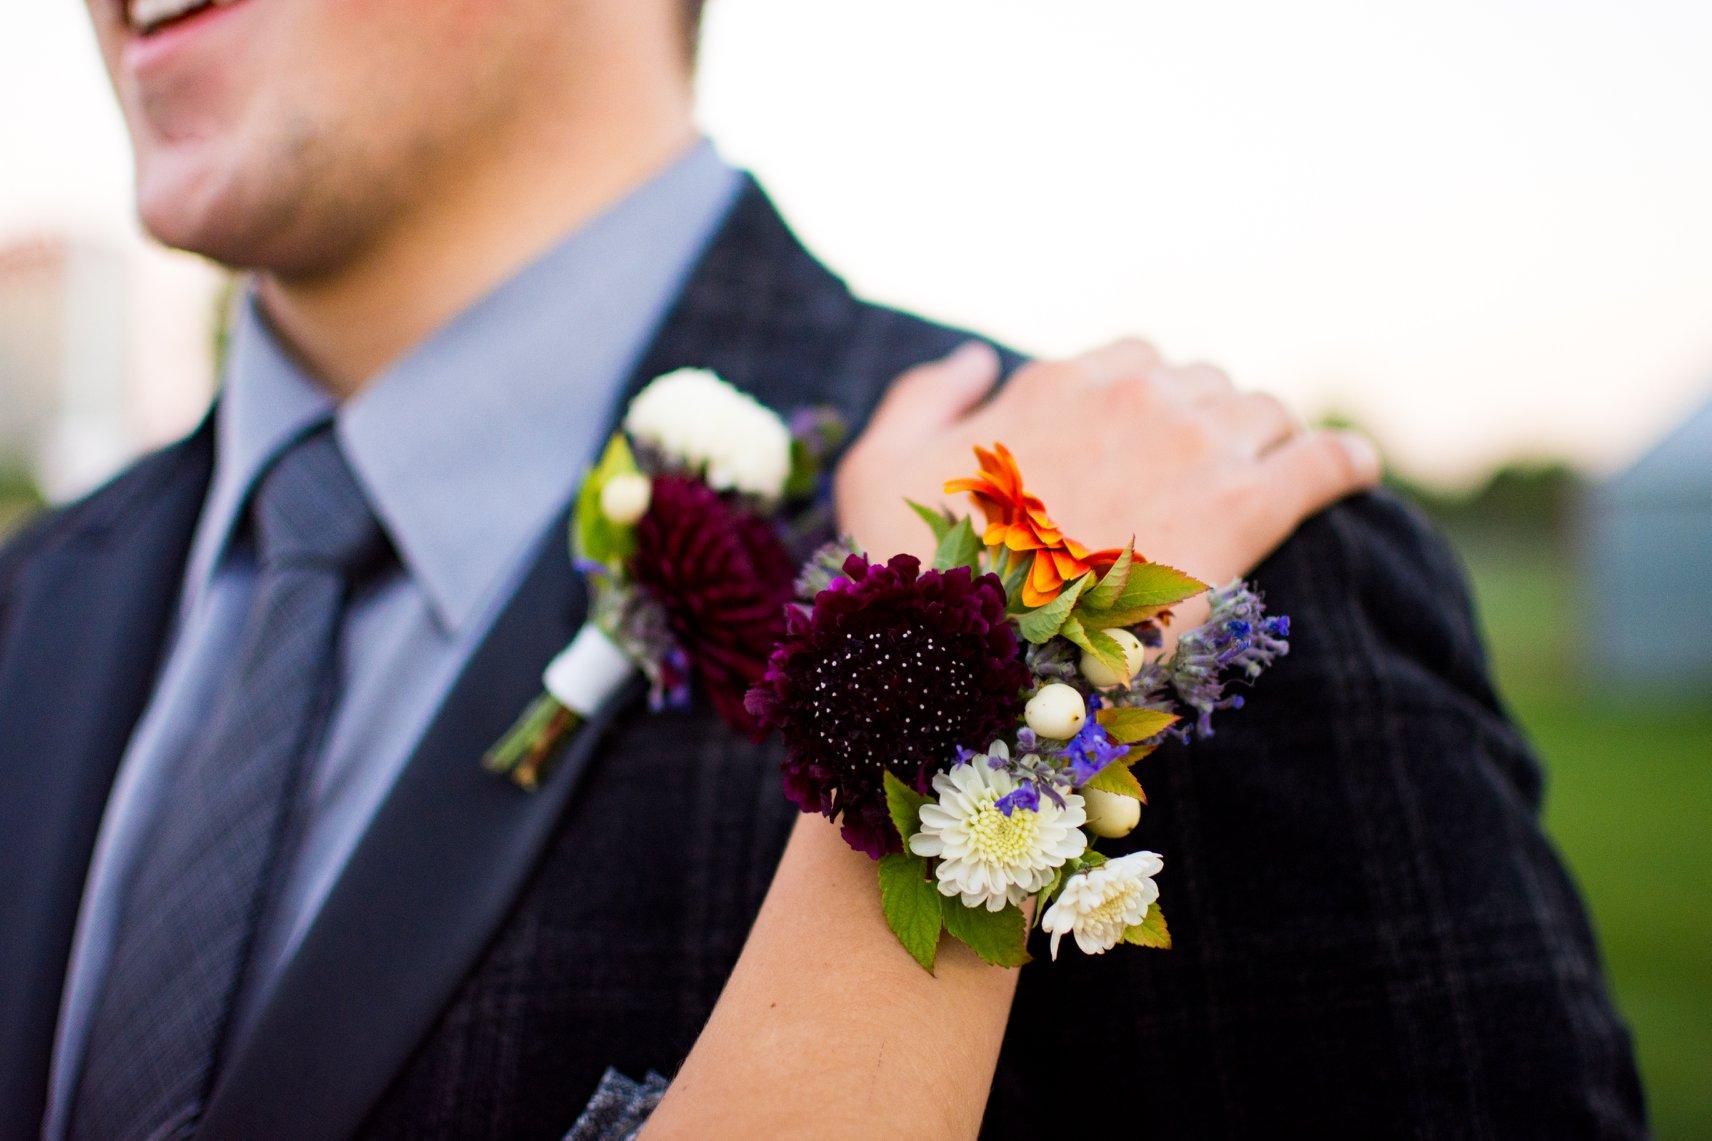 Wrist corsage-$ 15 -